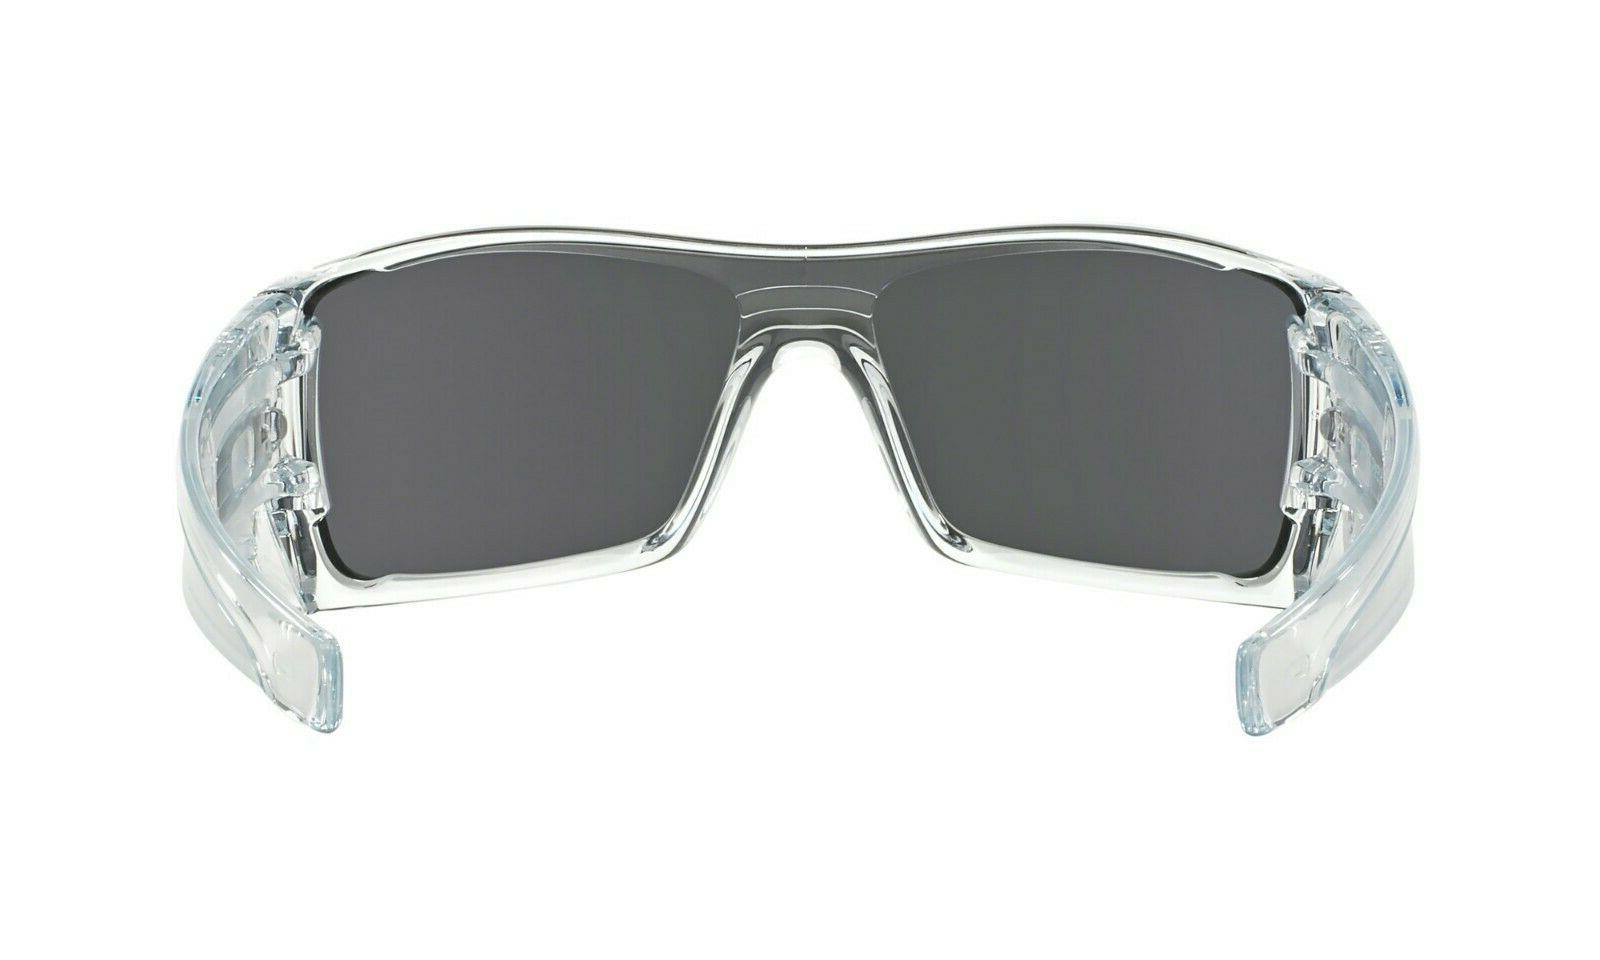 Oakley Batwolf Sunglasses Polished Clear Iridium Lens NEW